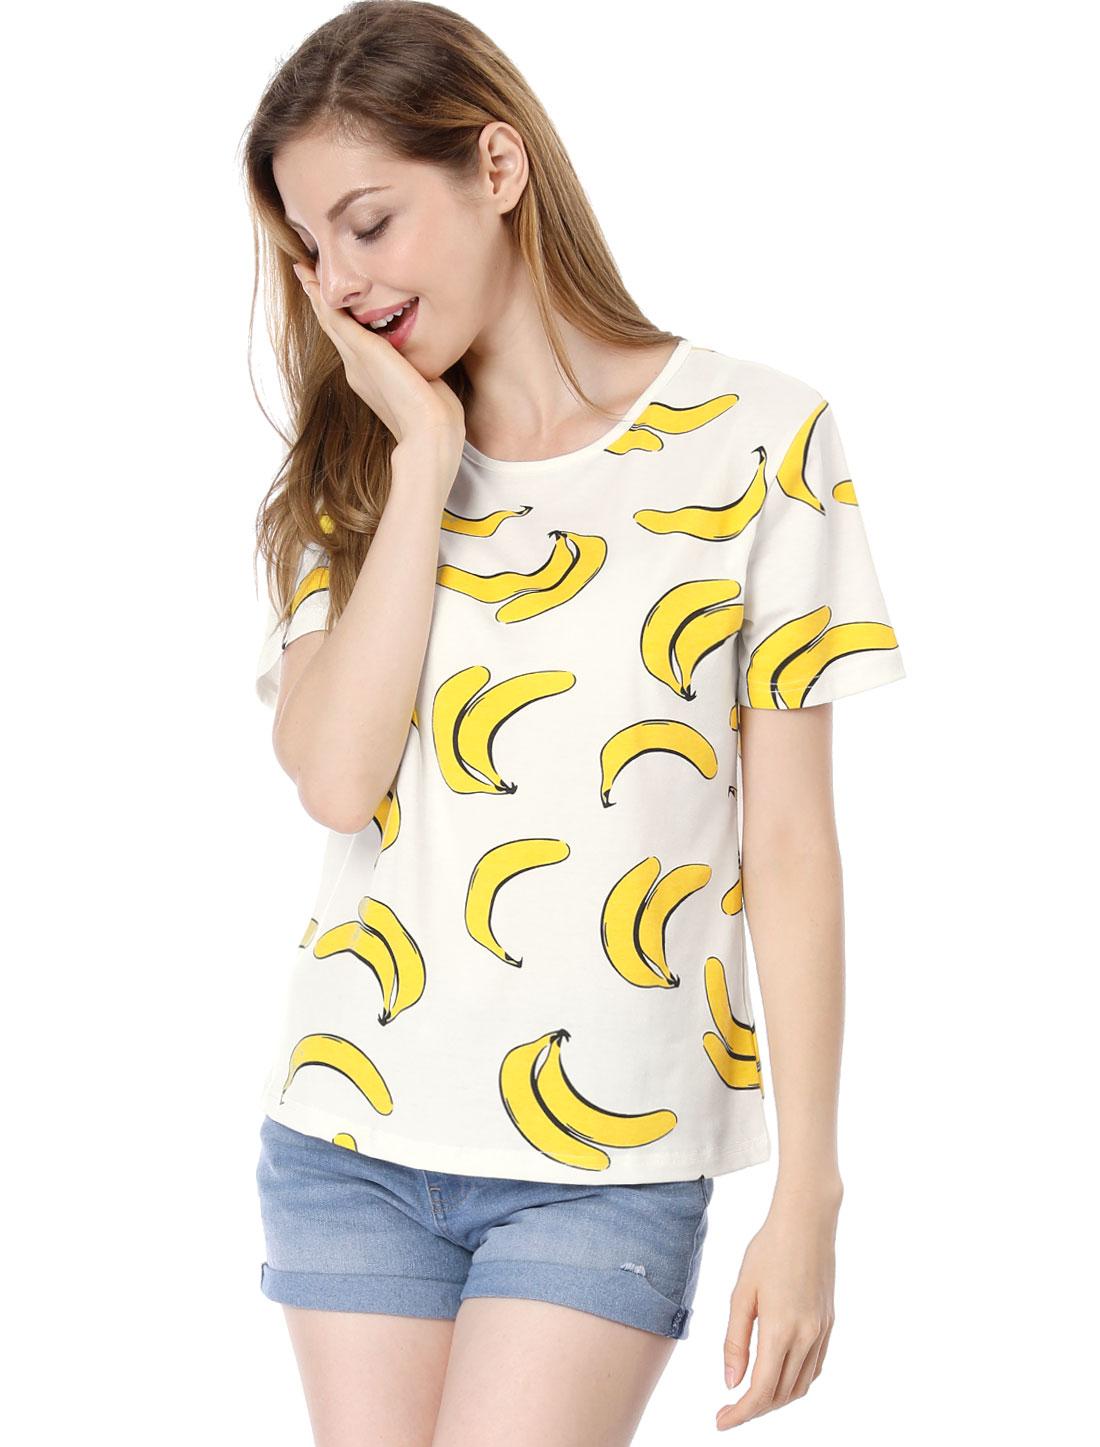 Ladies Short-Sleeve Bananas Printed Casual T-Shirts White L